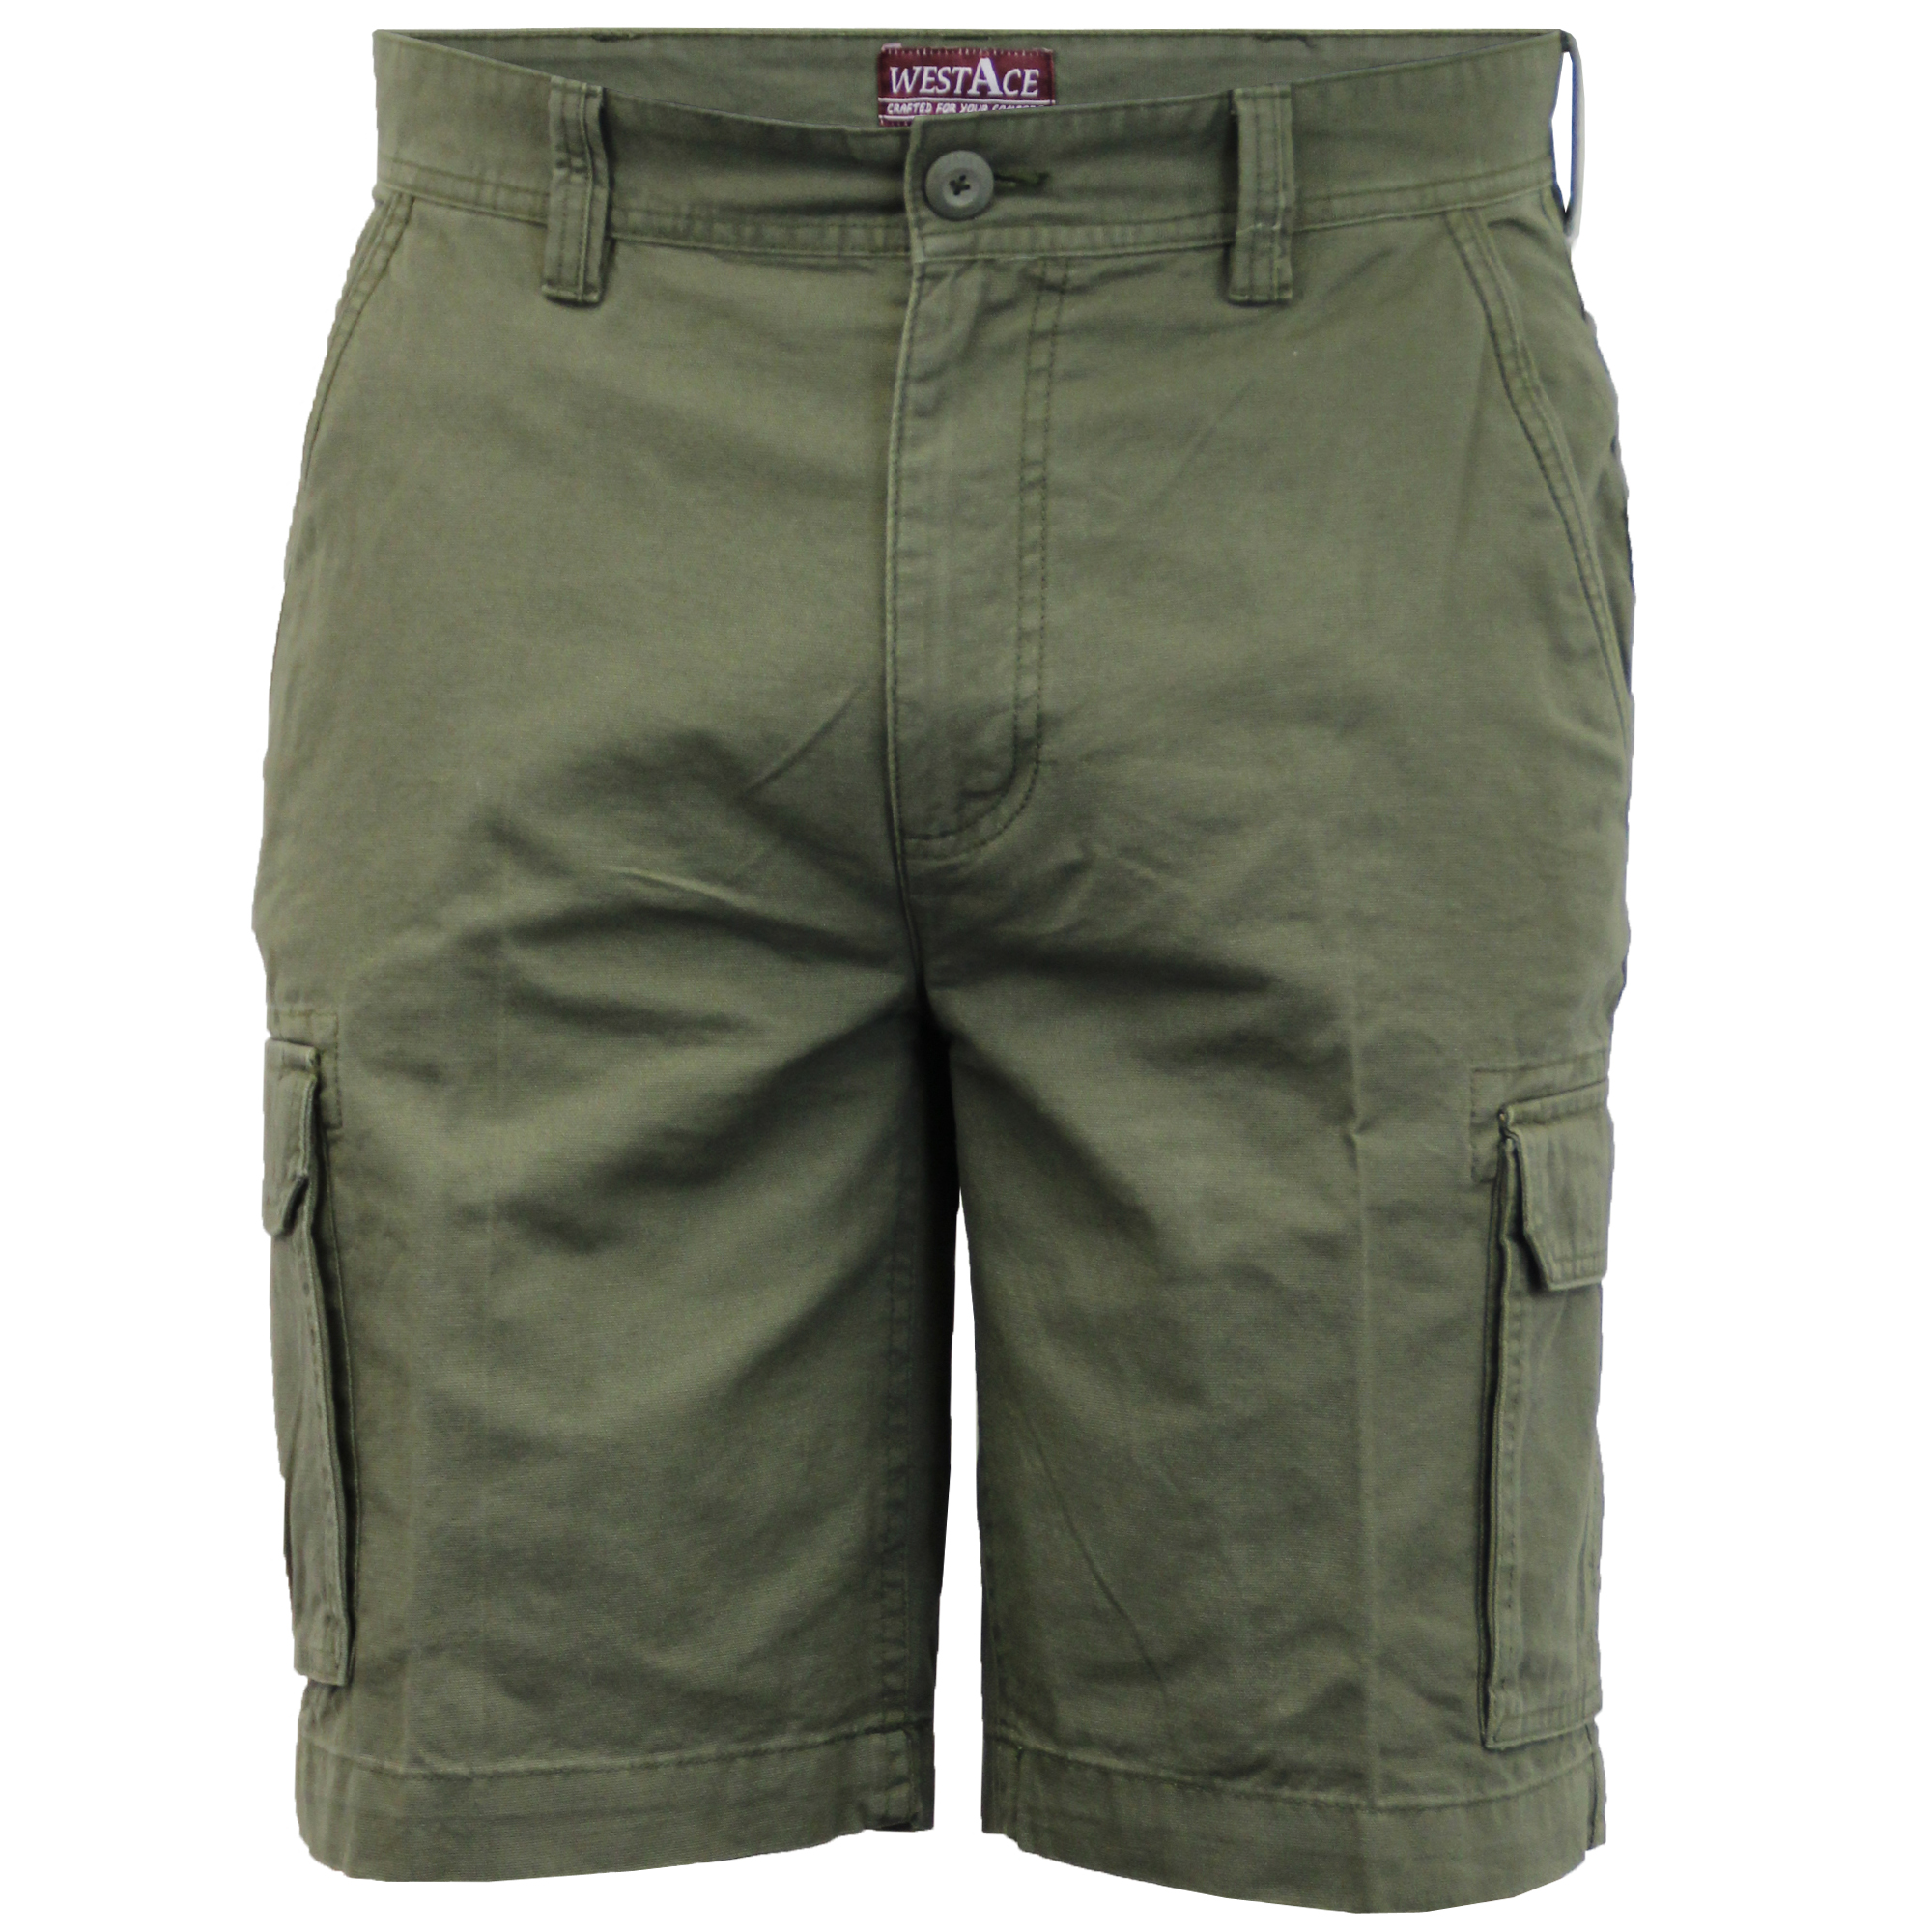 Mens-Cargo-Chino-Shorts-Threadbare-Combat-Knee-Length-Westace-Military-Summer thumbnail 13